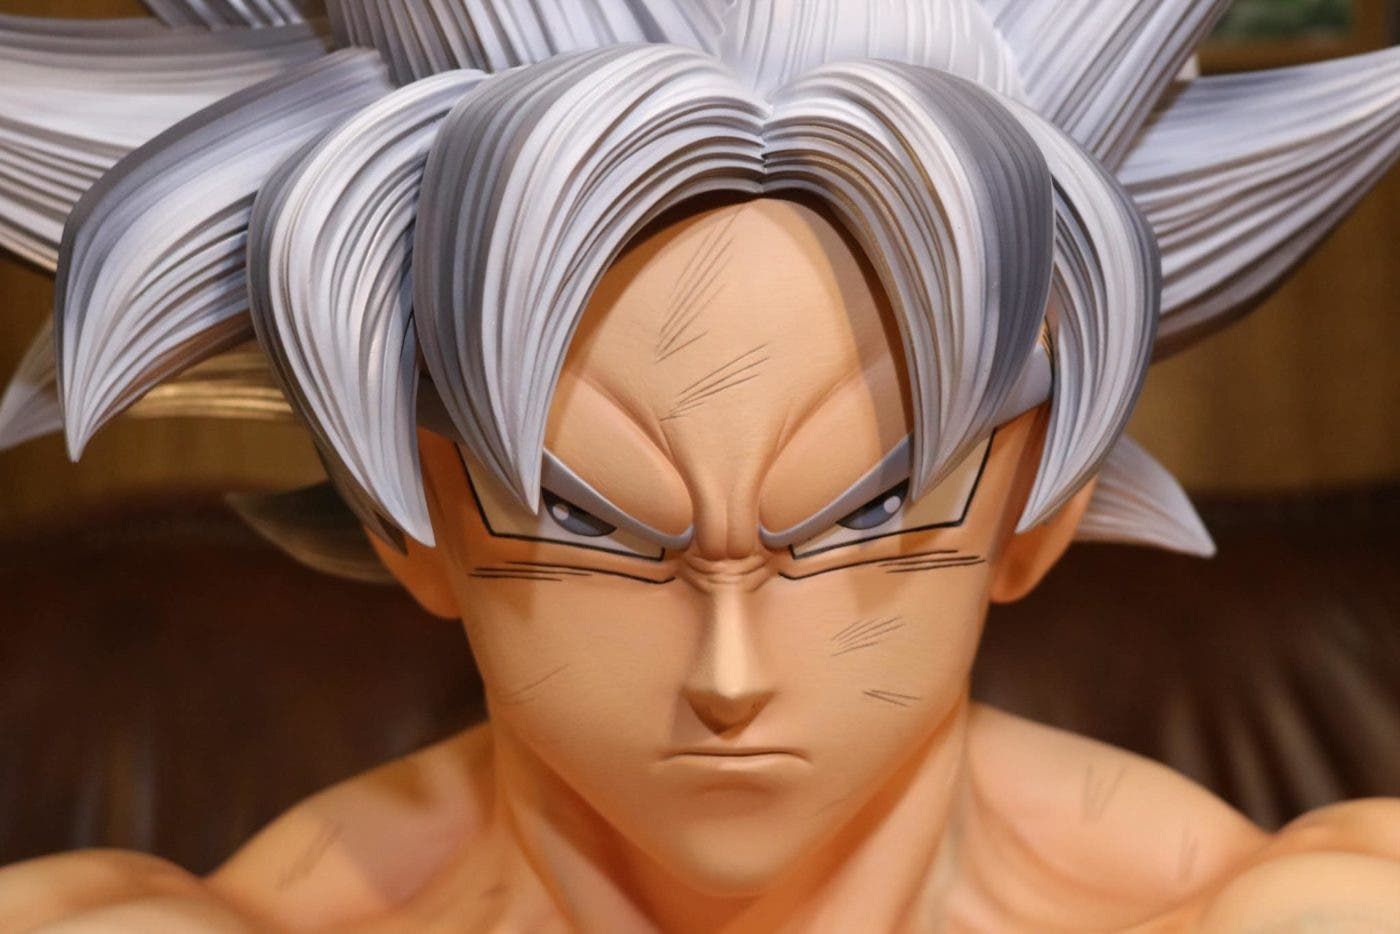 Imagen de Dragon Ball Super: El increíble busto de Goku Ultra Instinto que desearás tener